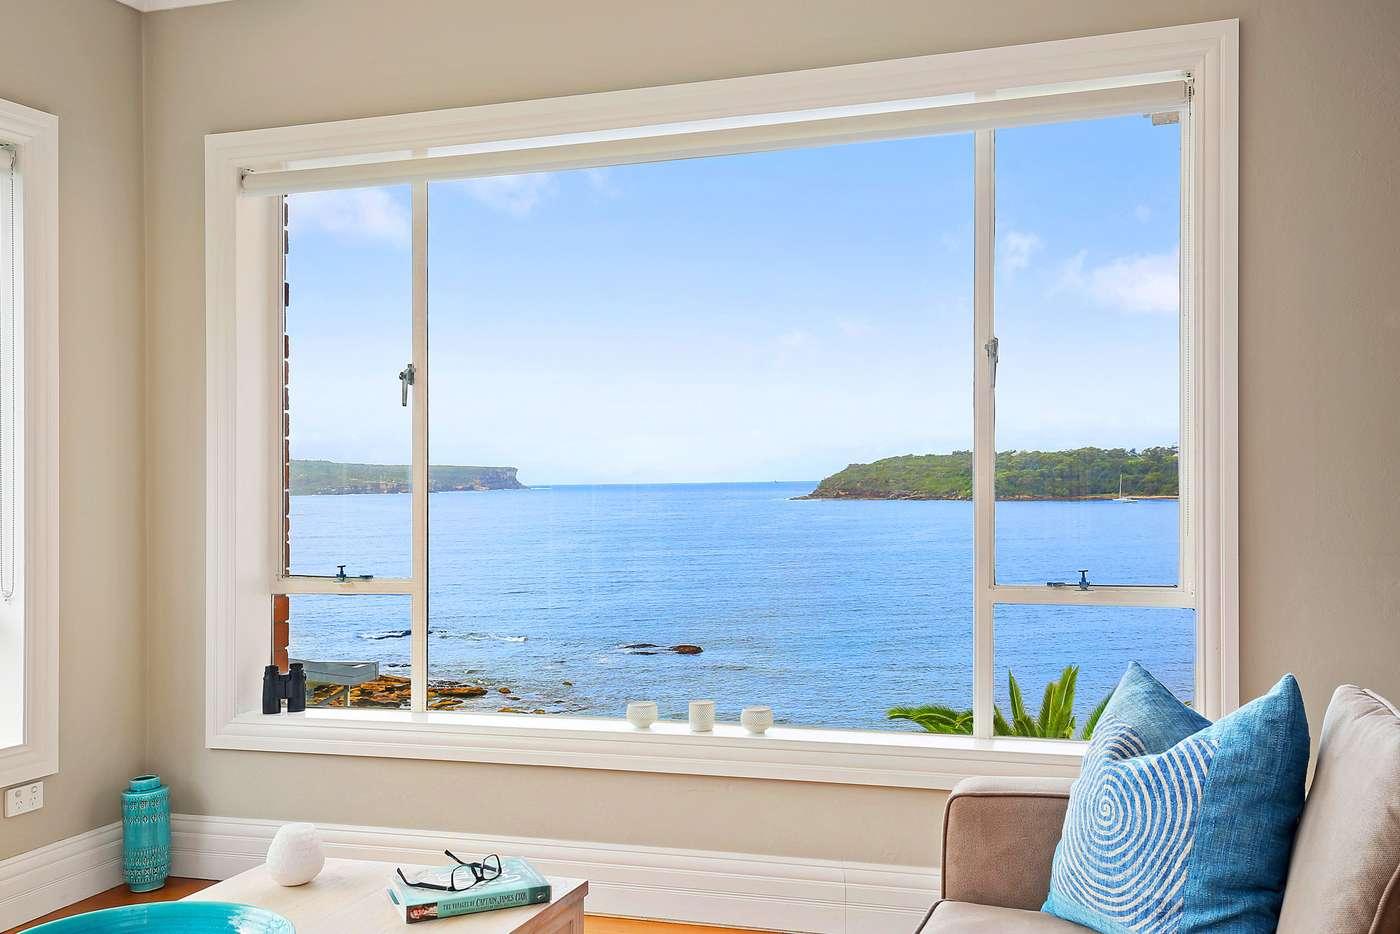 Main view of Homely apartment listing, 41/6 Wyargine Street, Mosman NSW 2088